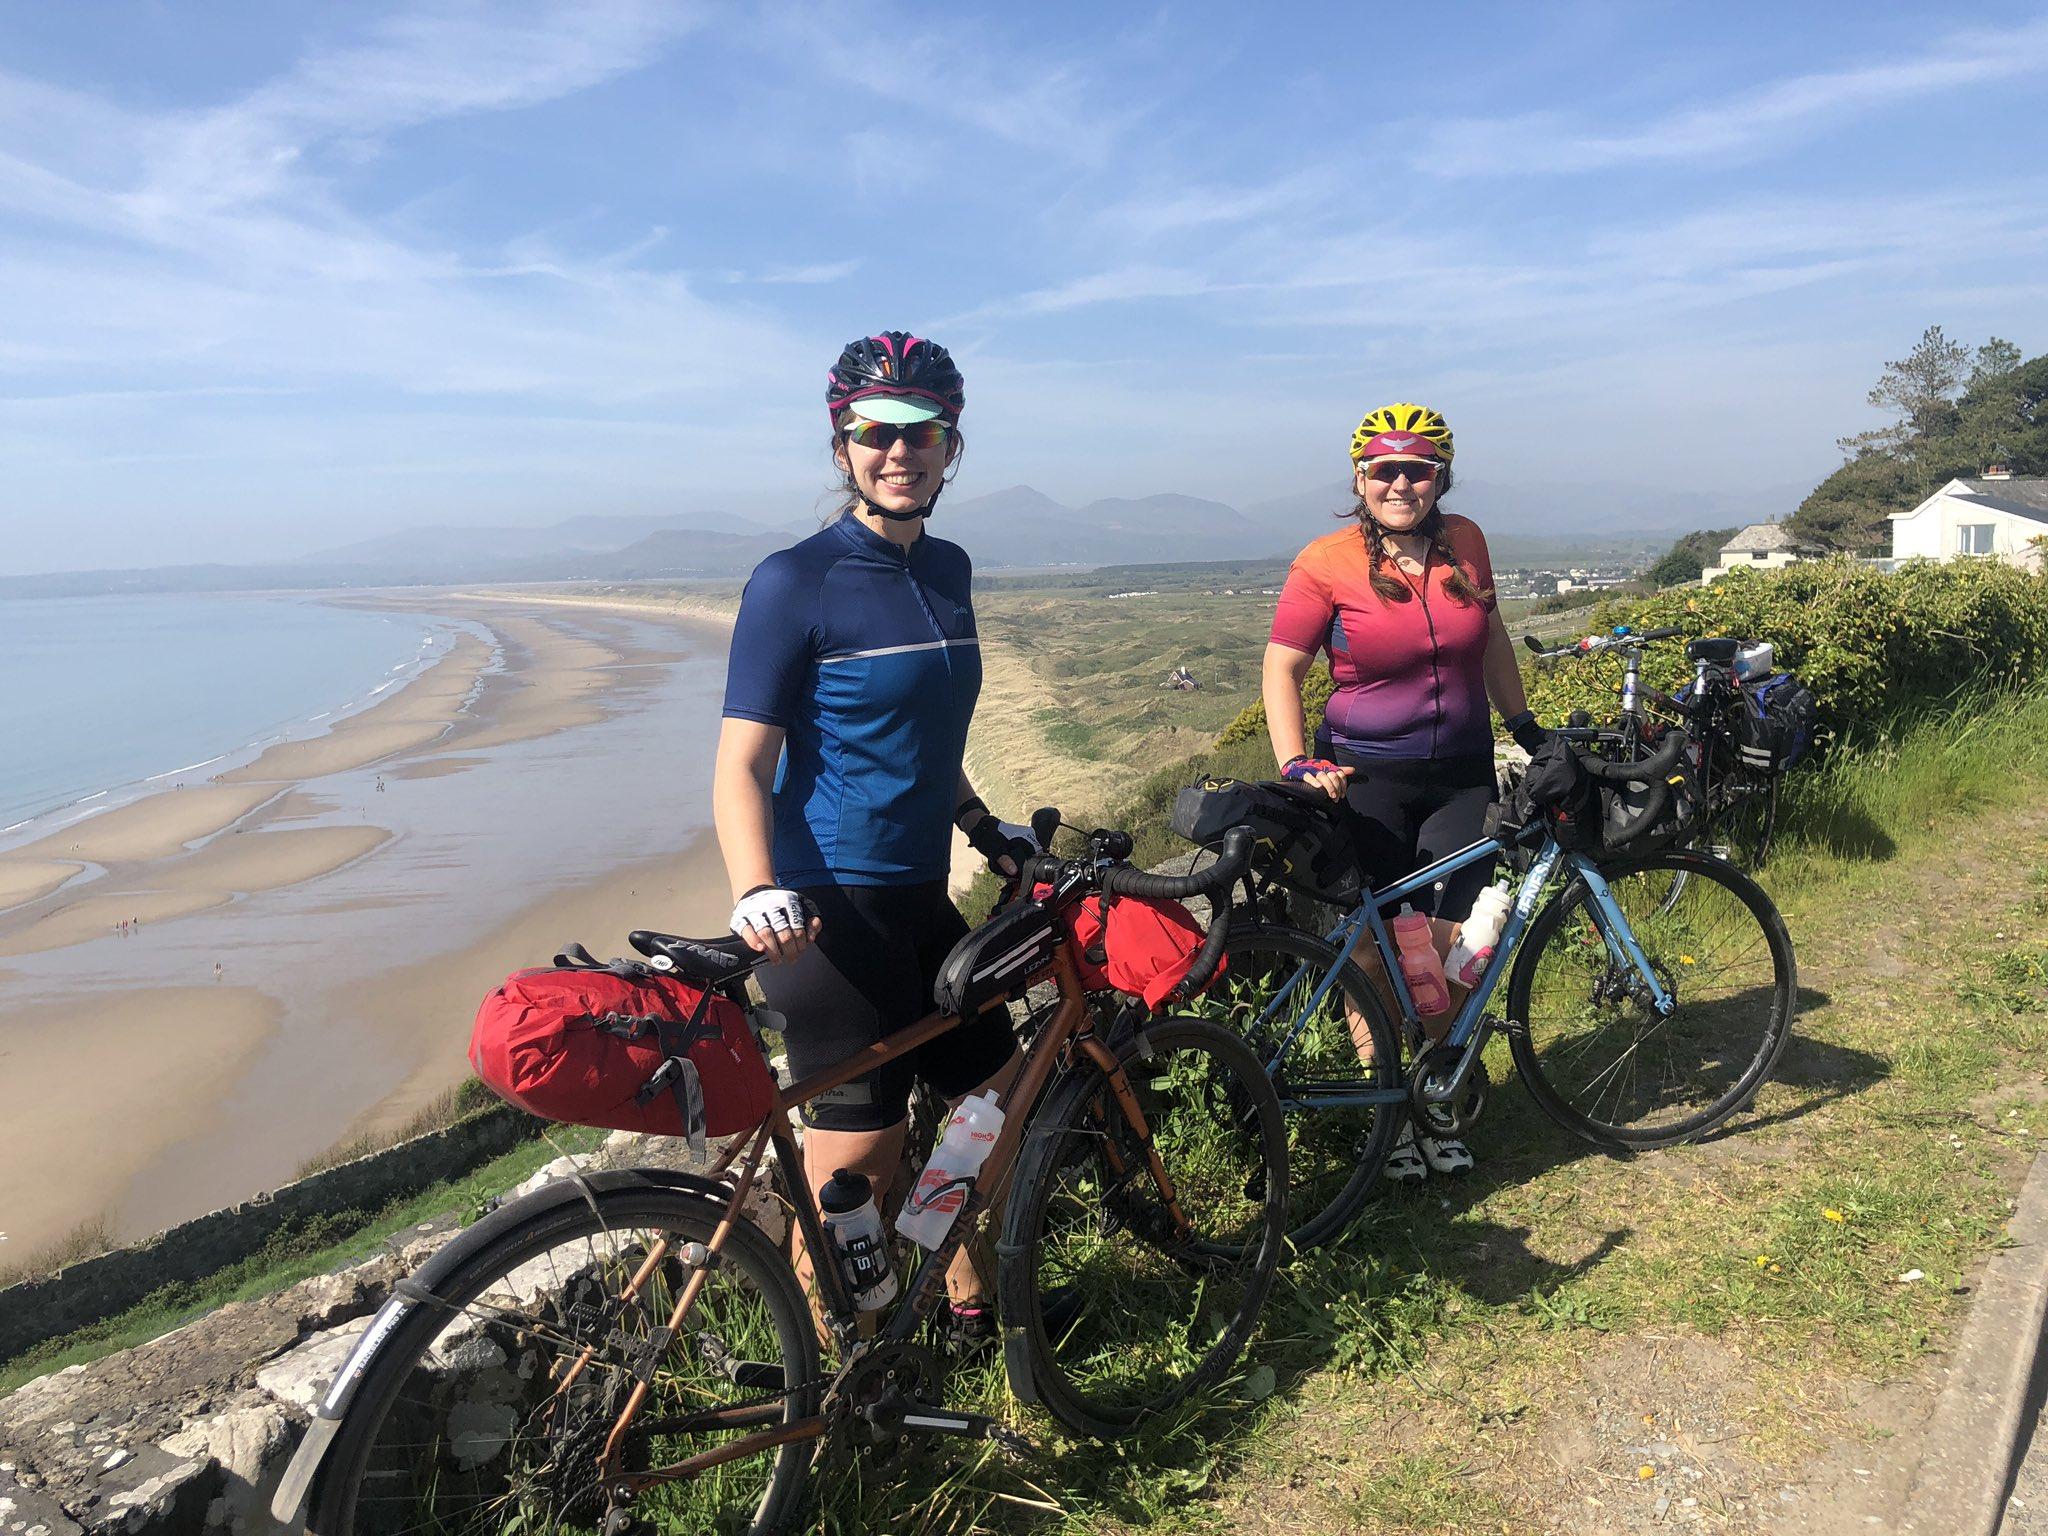 Cycling across Wales on the Lon Las Cymru